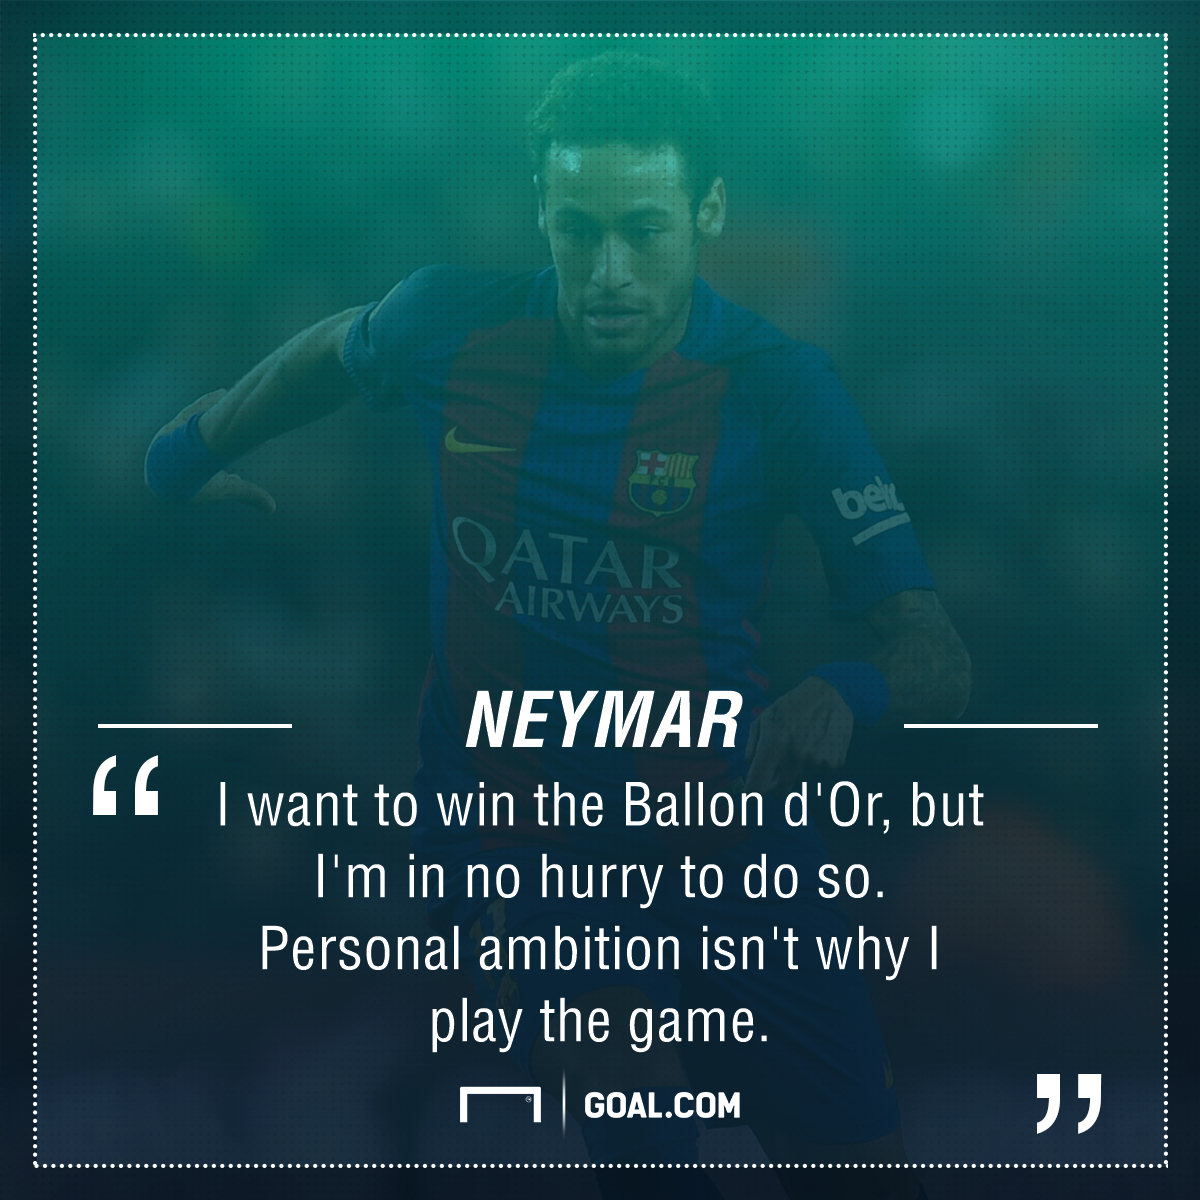 Neymar Ballon d'Or